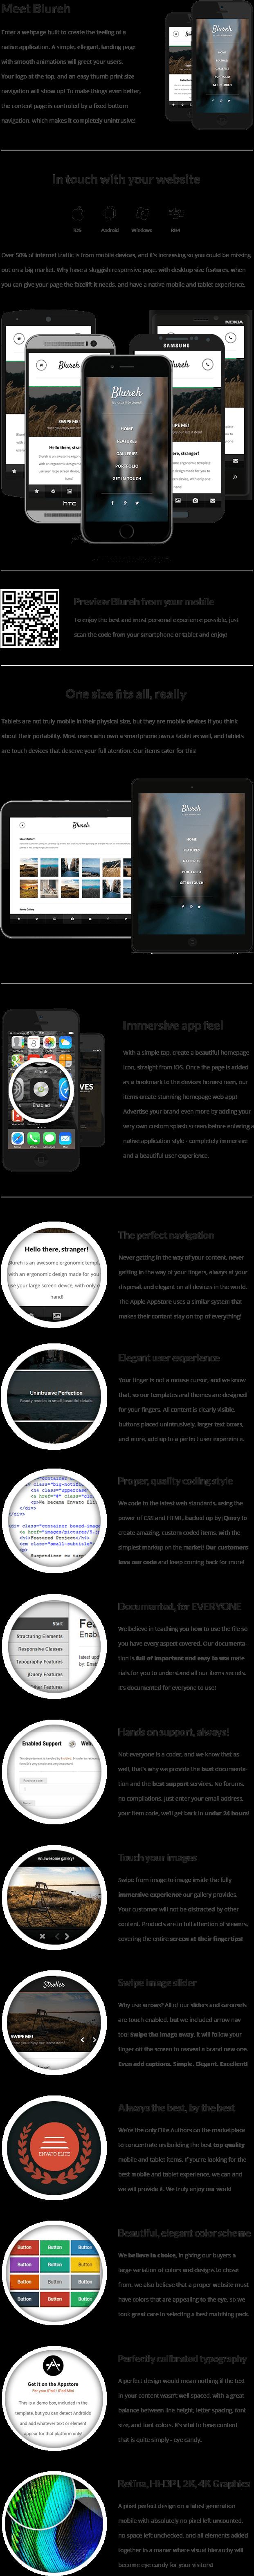 Blureh Mobile   Mobile Template - 9